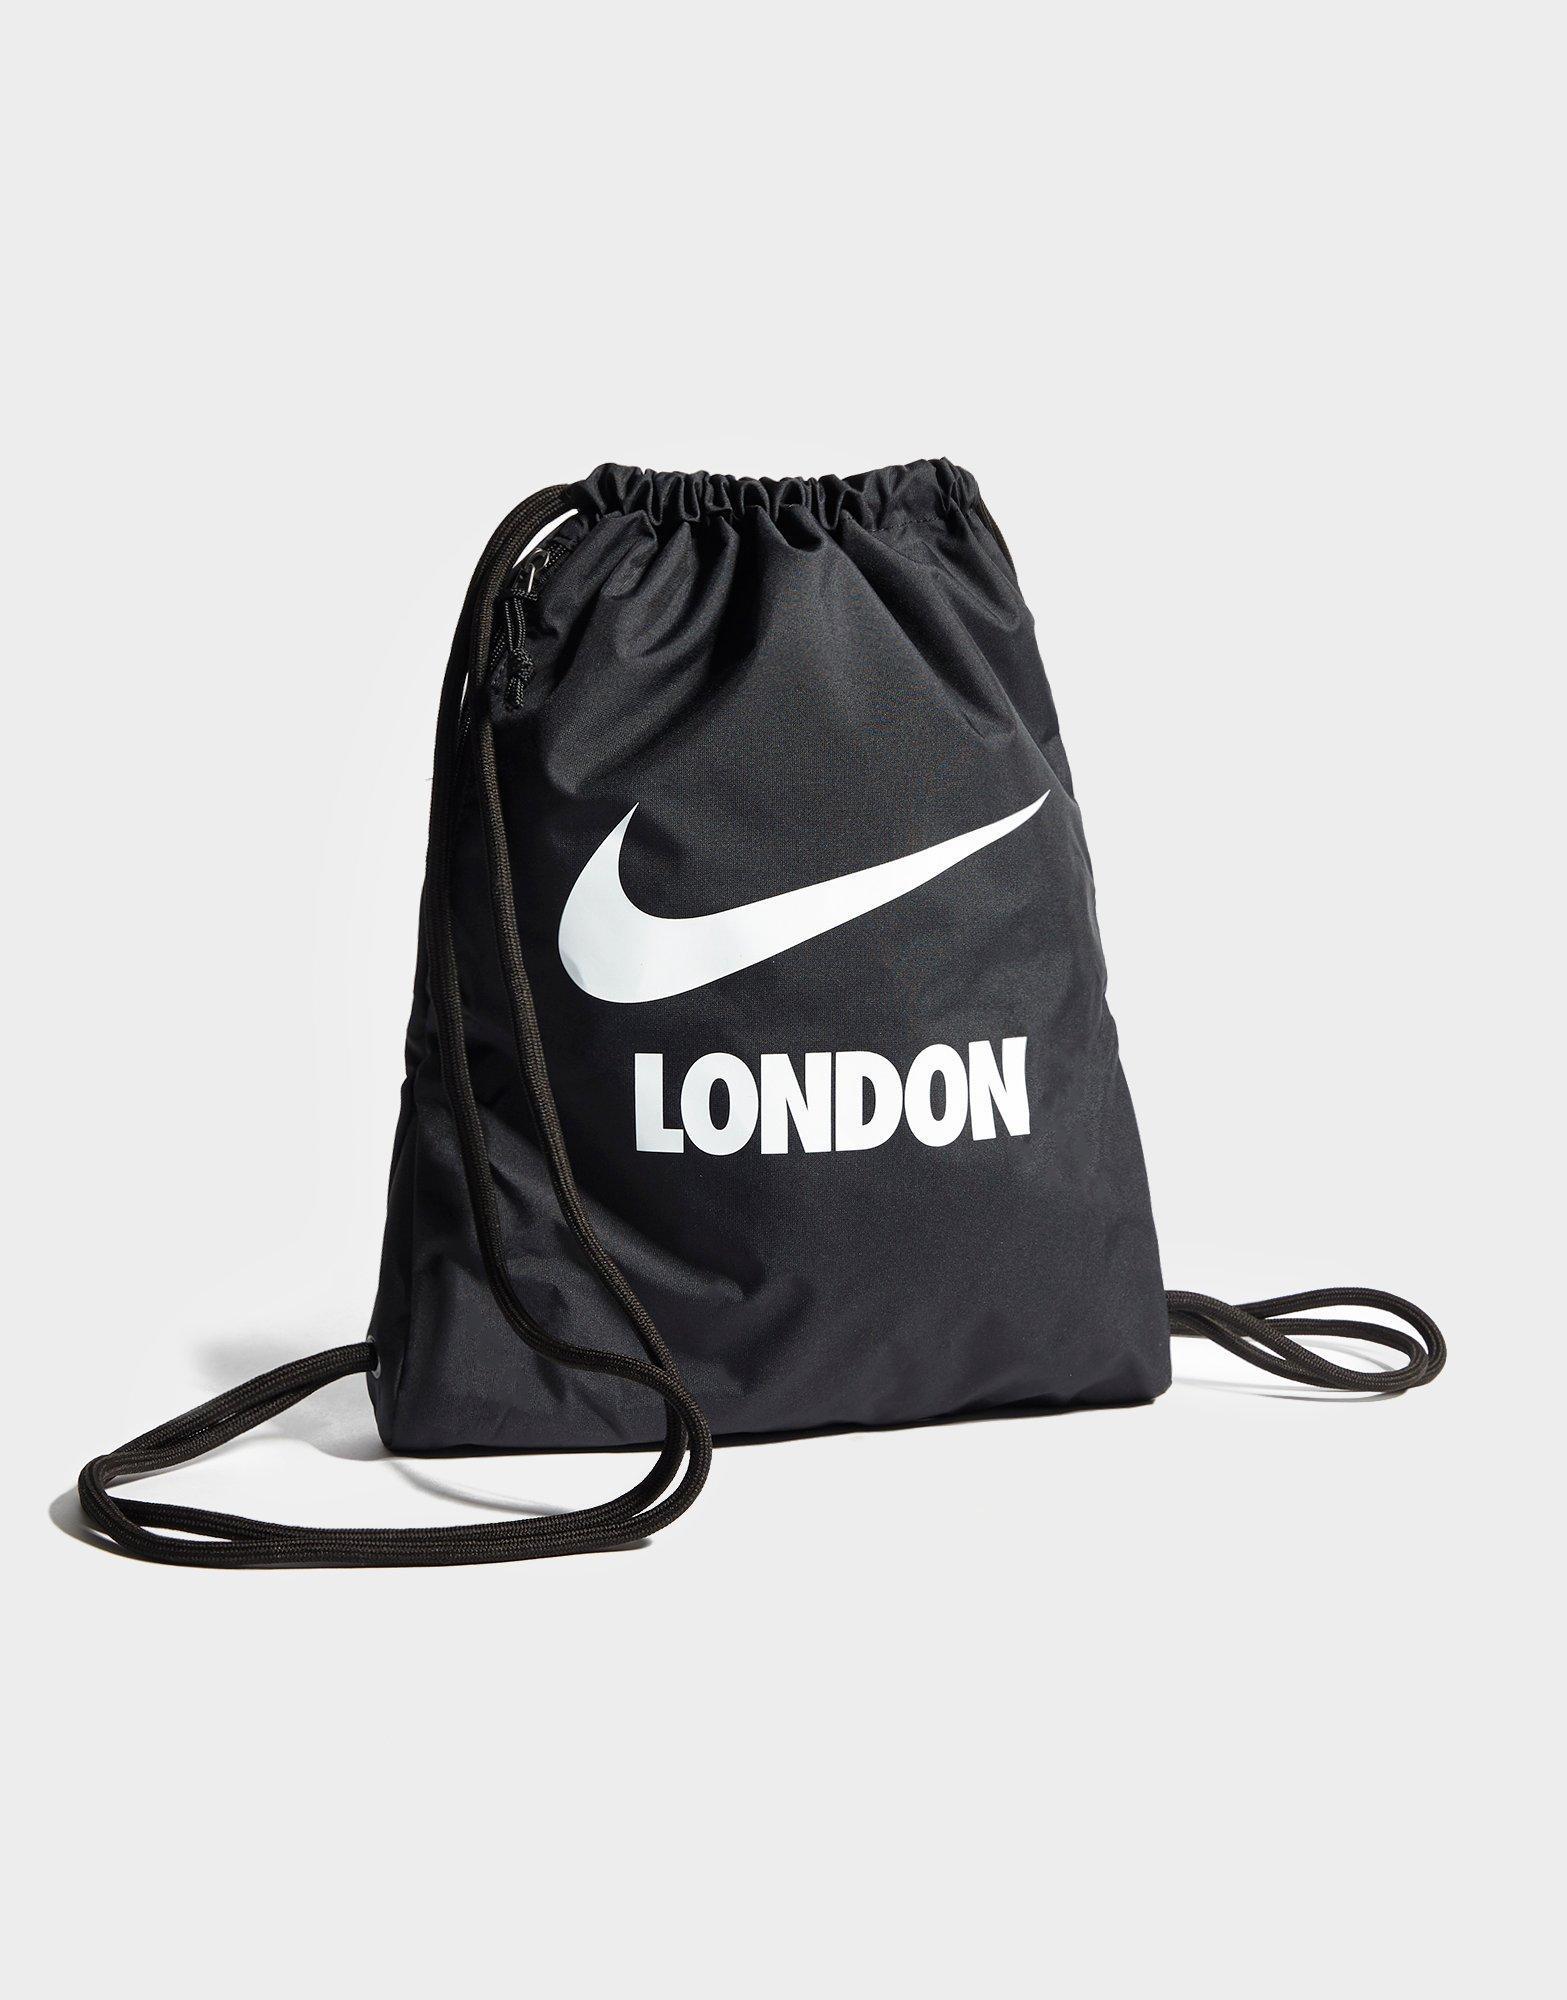 Lyst - Nike London Gym Sack in Black for Men 021ad3ba4333c